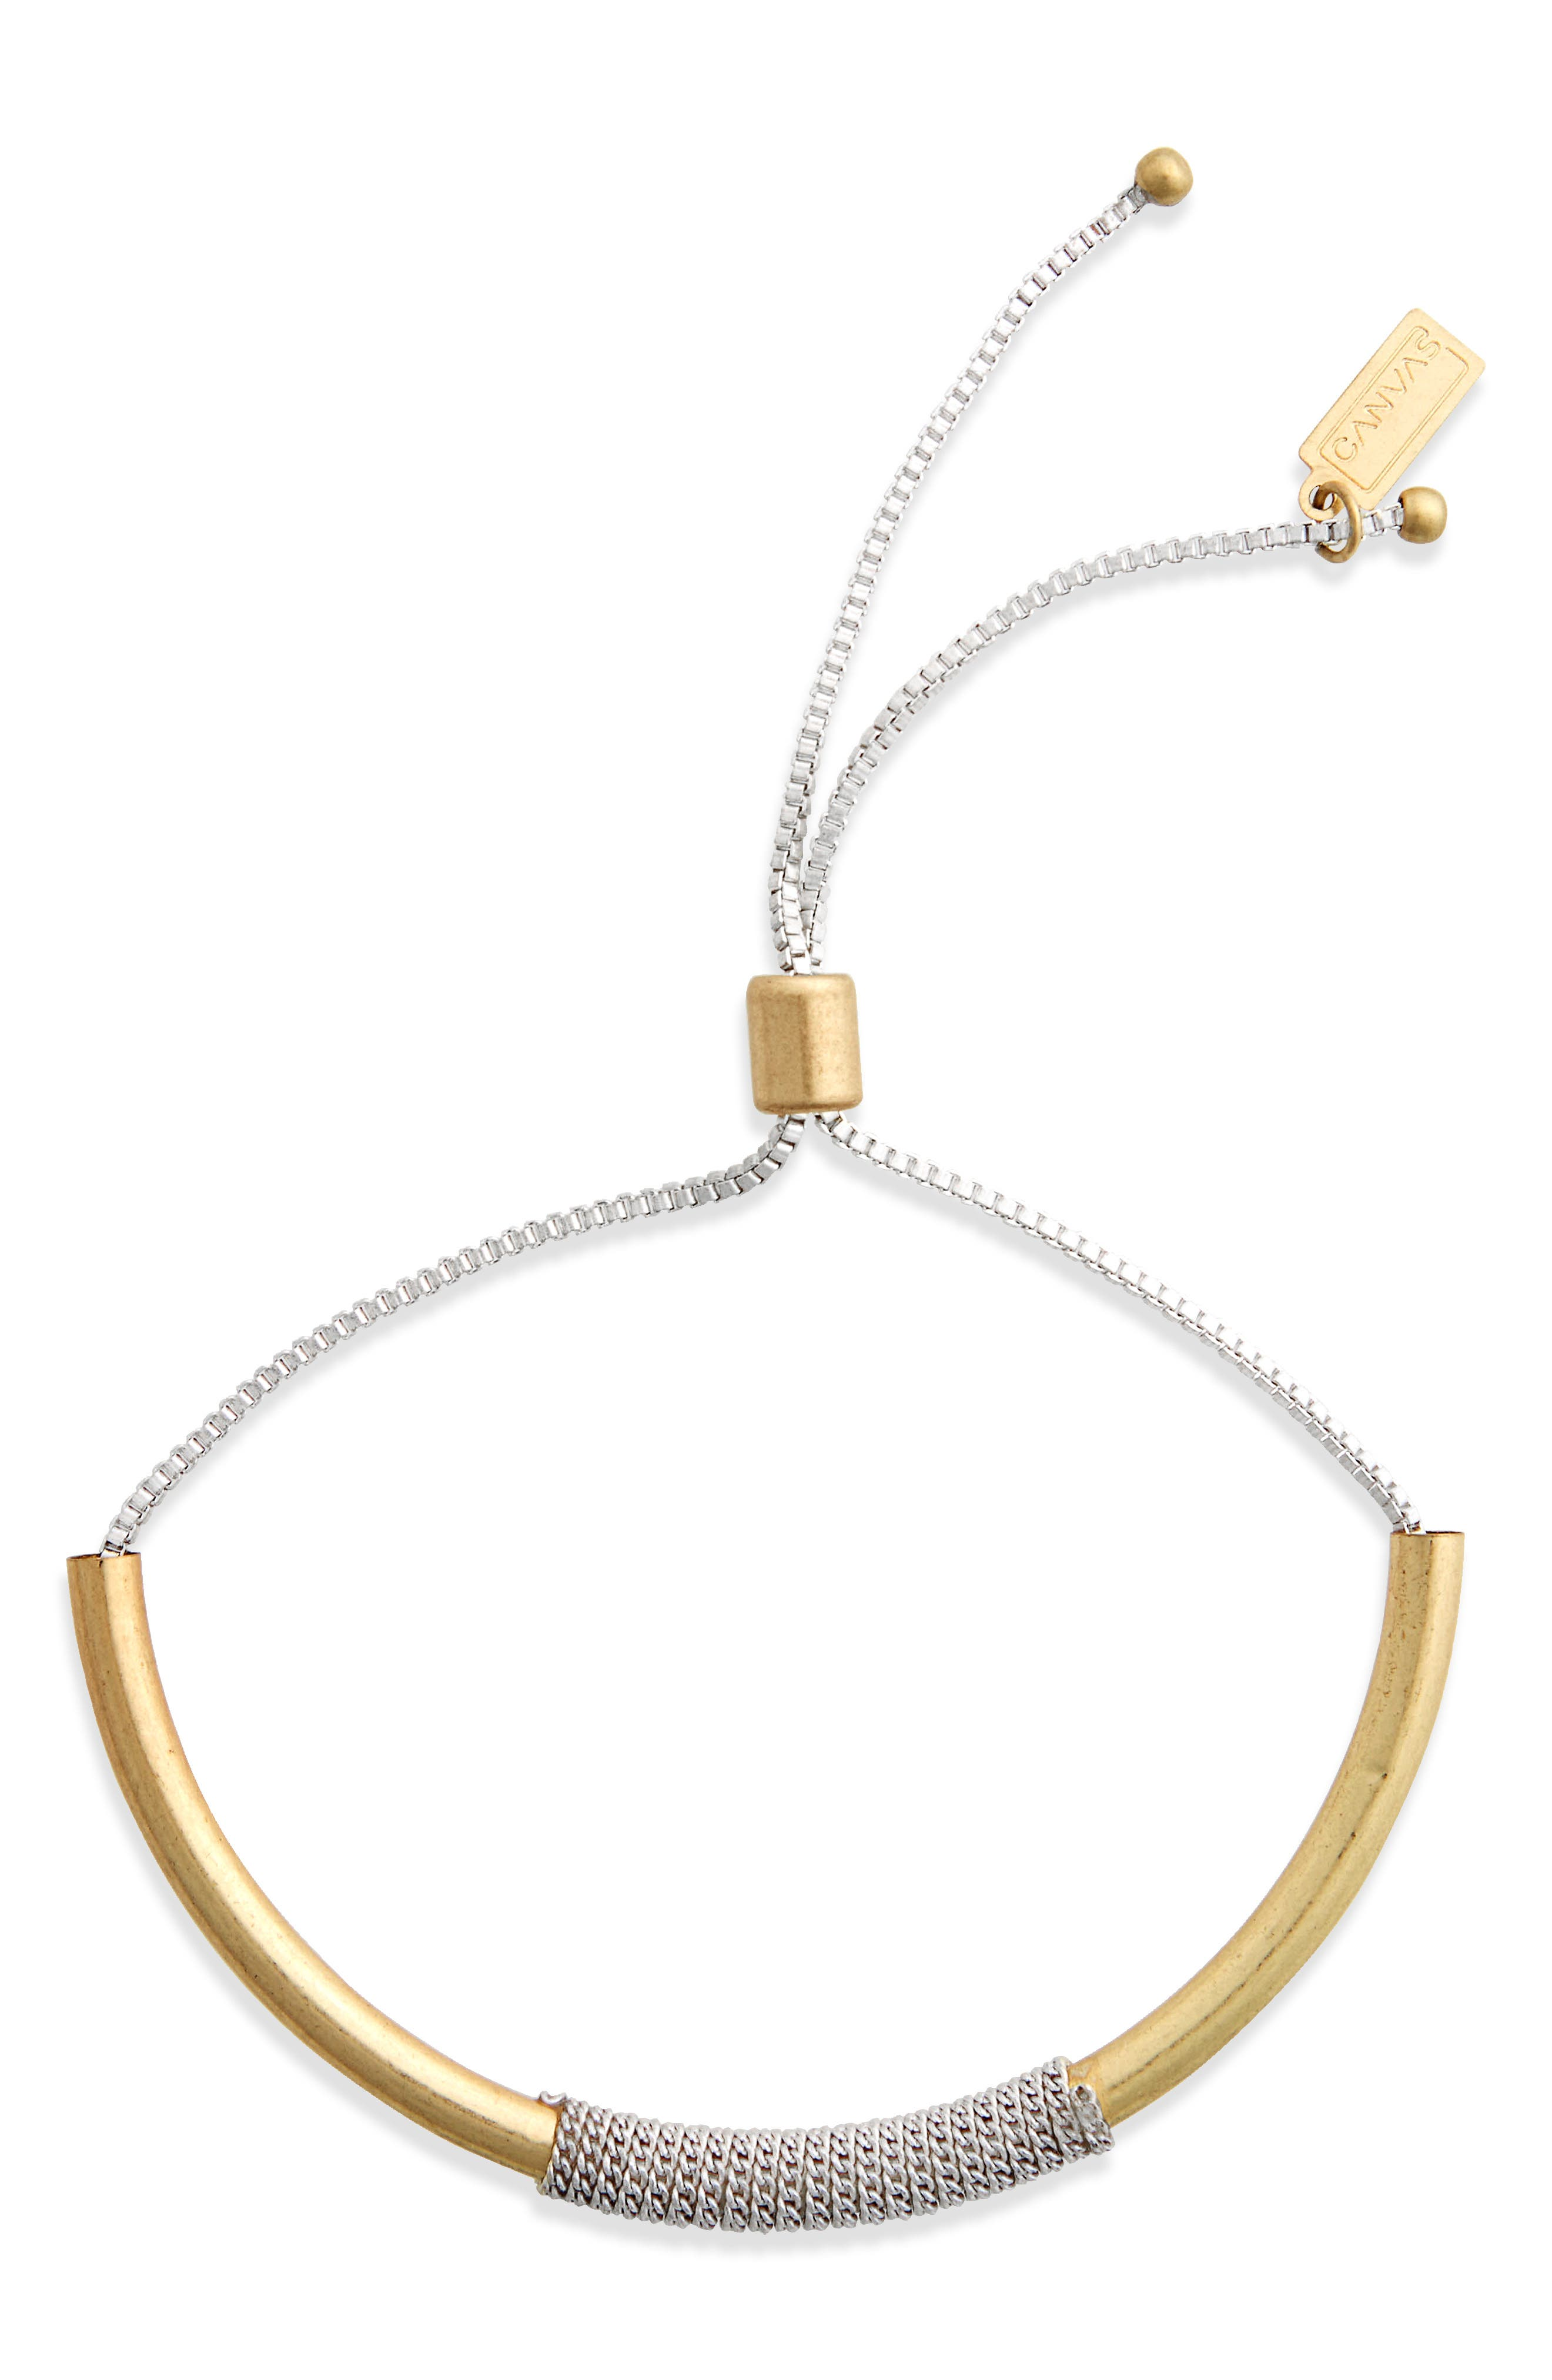 Chain & Metal Bar Bolo Bracelet,                         Main,                         color, Two Tone